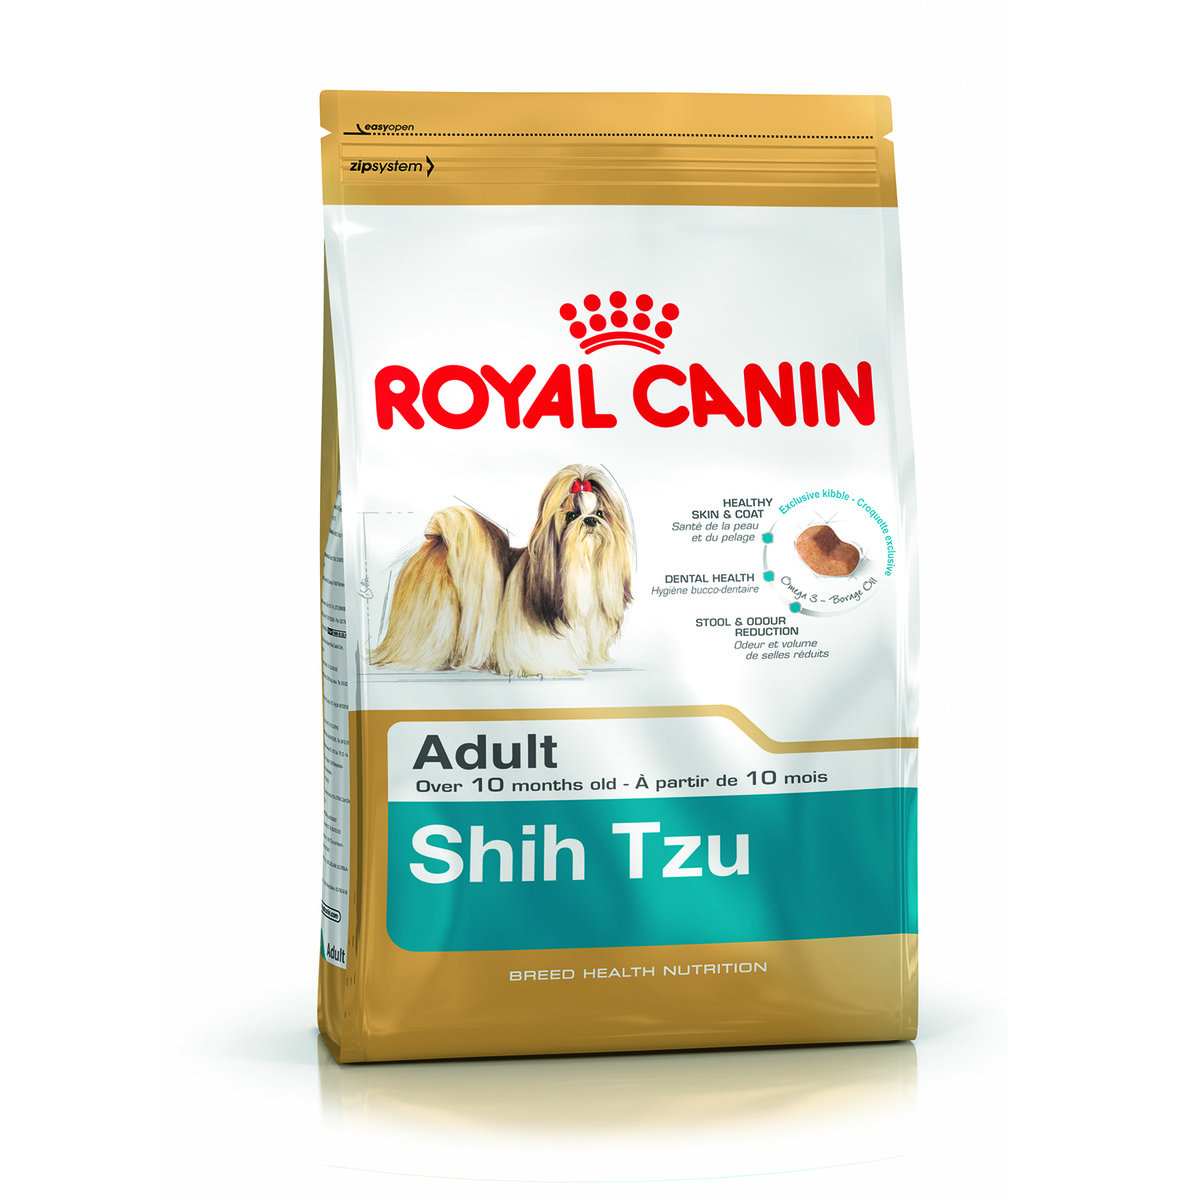 Shih Tzu 西施配方 (SHT24)